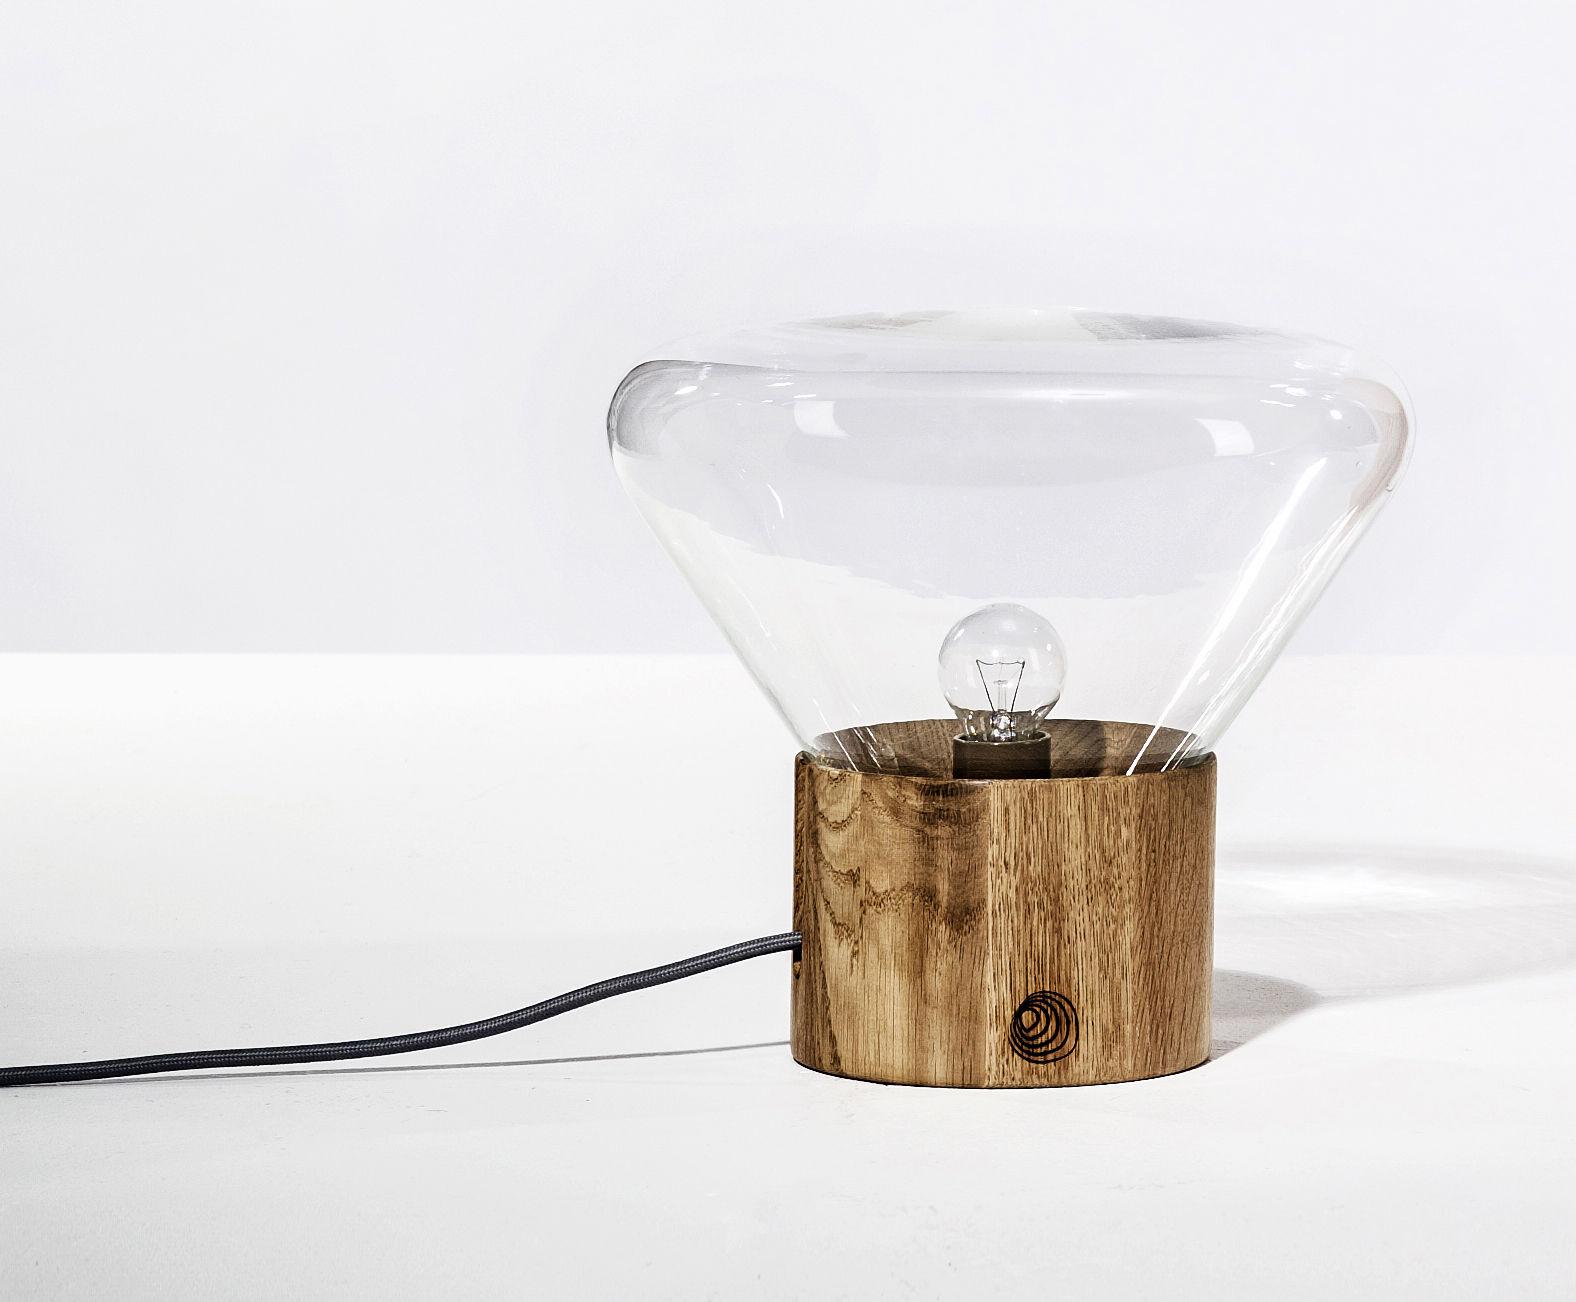 lampe de table mini muffin by brokis h 27 cm verre transparent gallery s bensimon. Black Bedroom Furniture Sets. Home Design Ideas